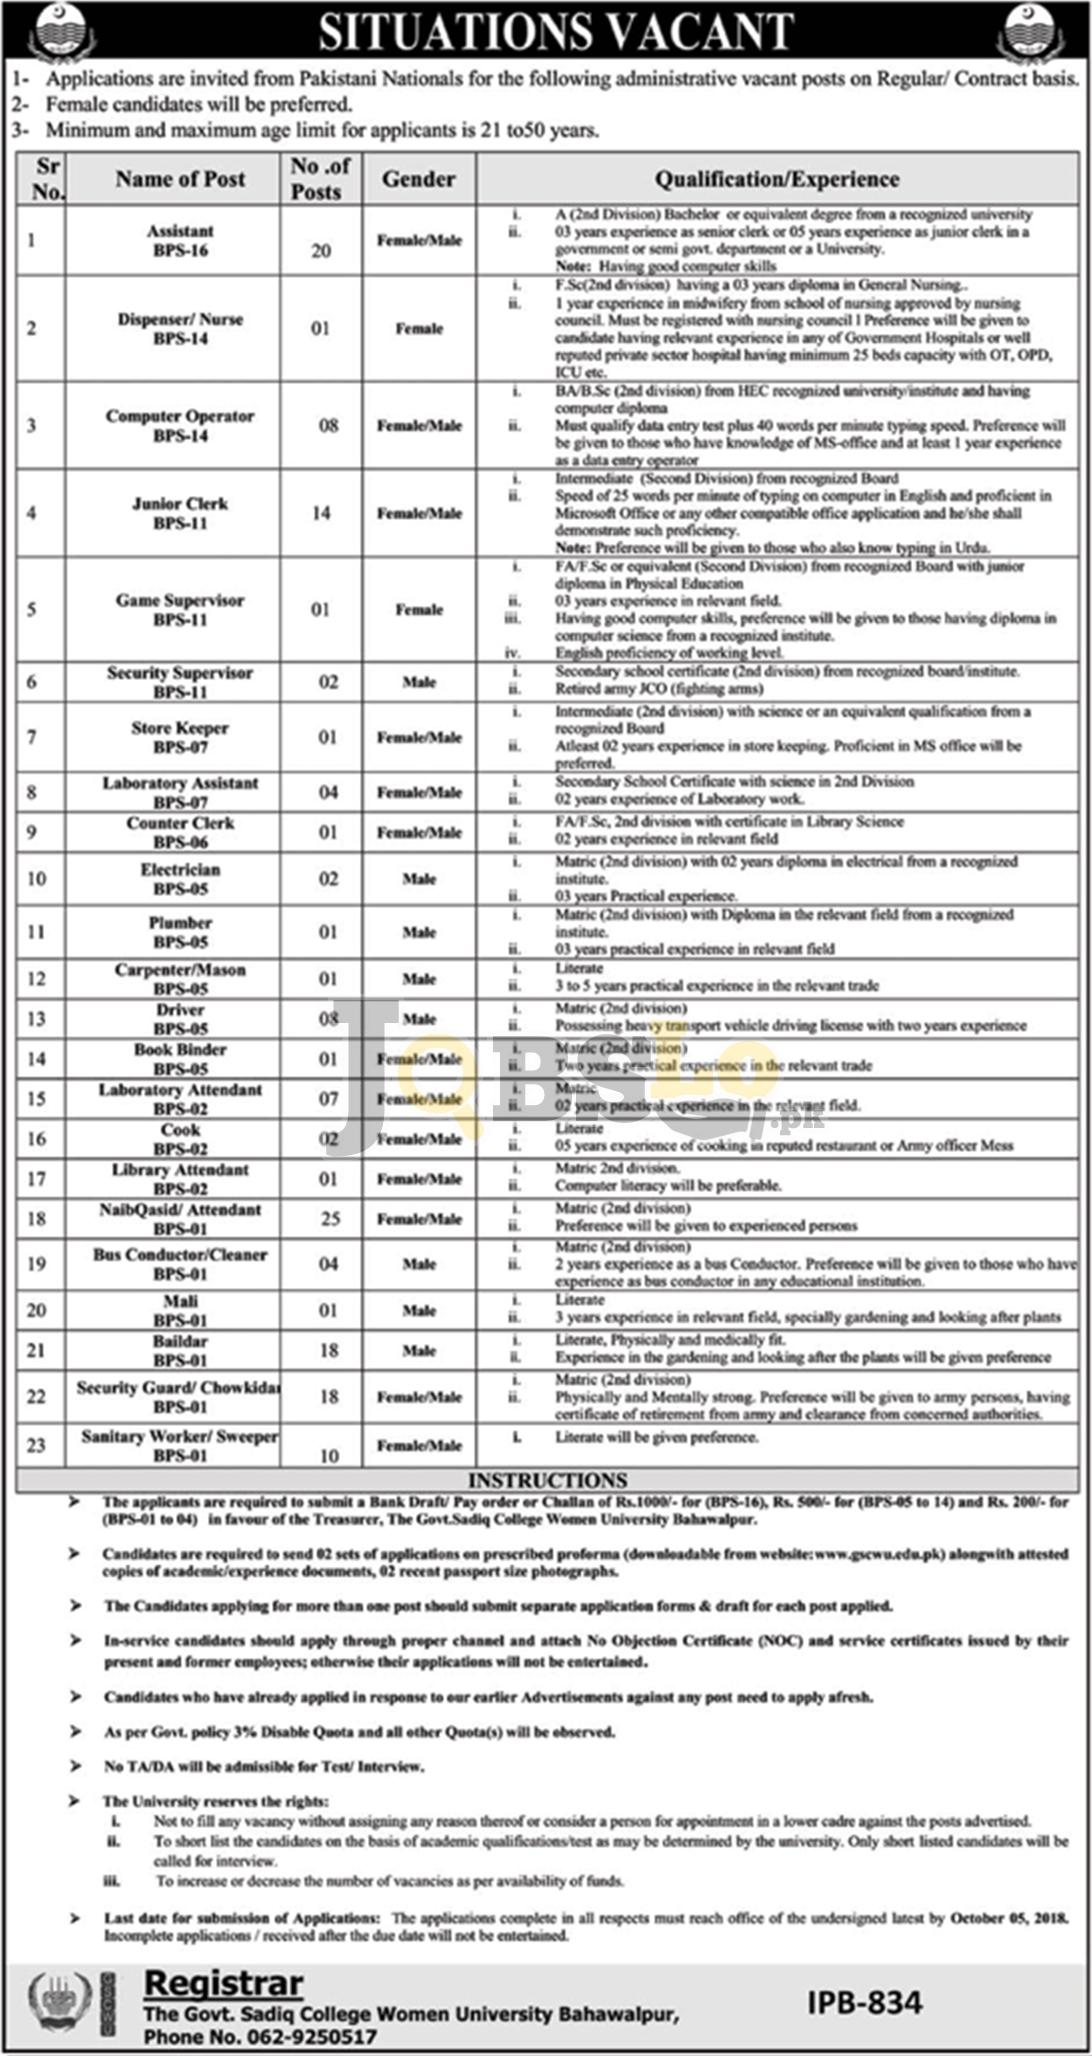 Jobs in Govt Sadiq Egerton College Bahawalpur 2018 Application Form Download Latest